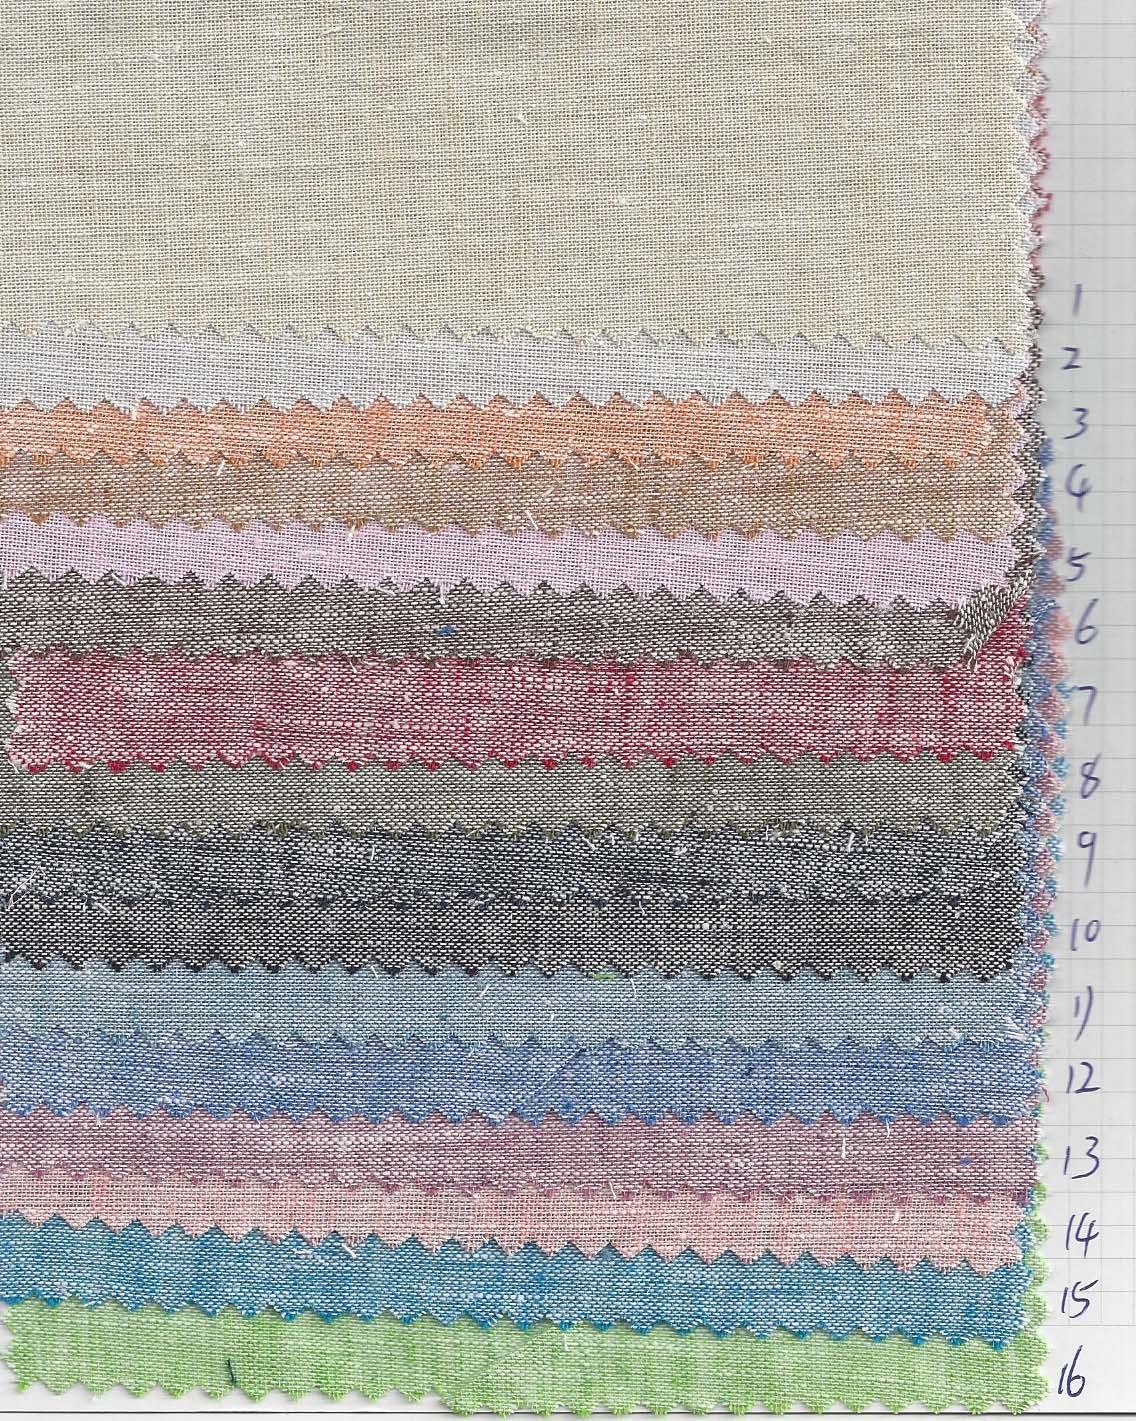 Yi Sheng Textile 16-007.jpg